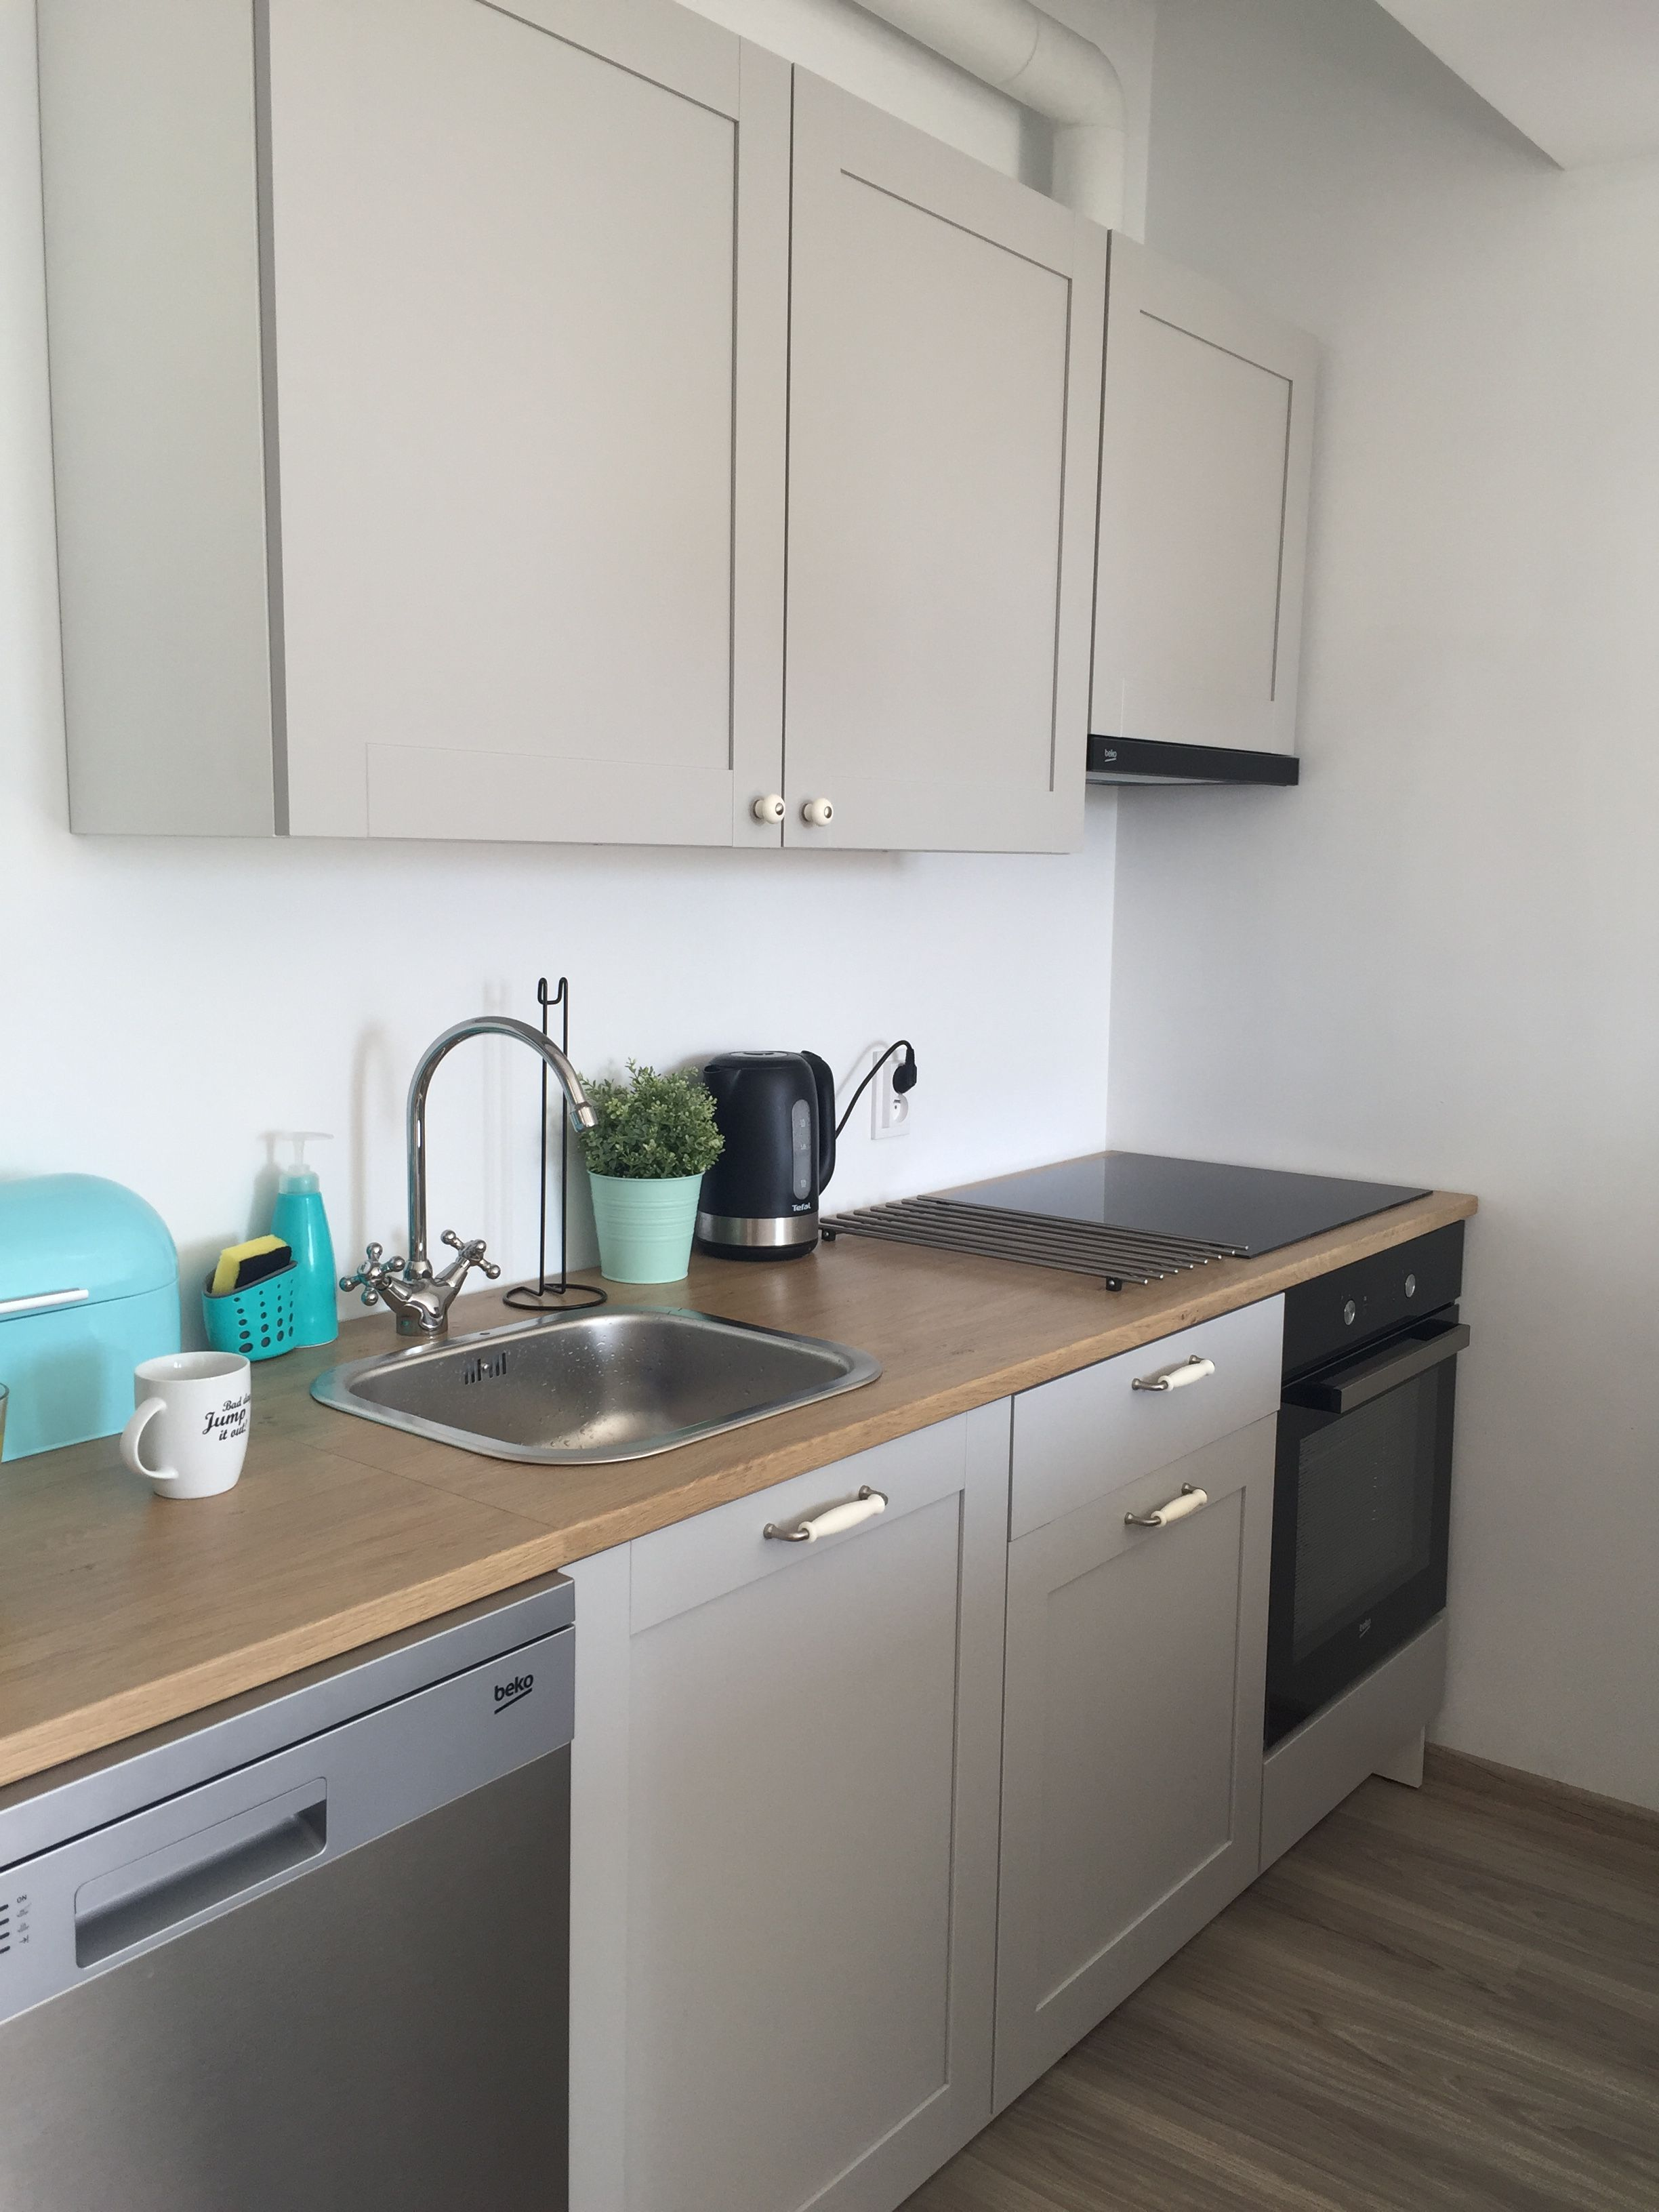 Knoxhult IKEA grey kitchen   Wohnung küche, Knoxhult ikea ...